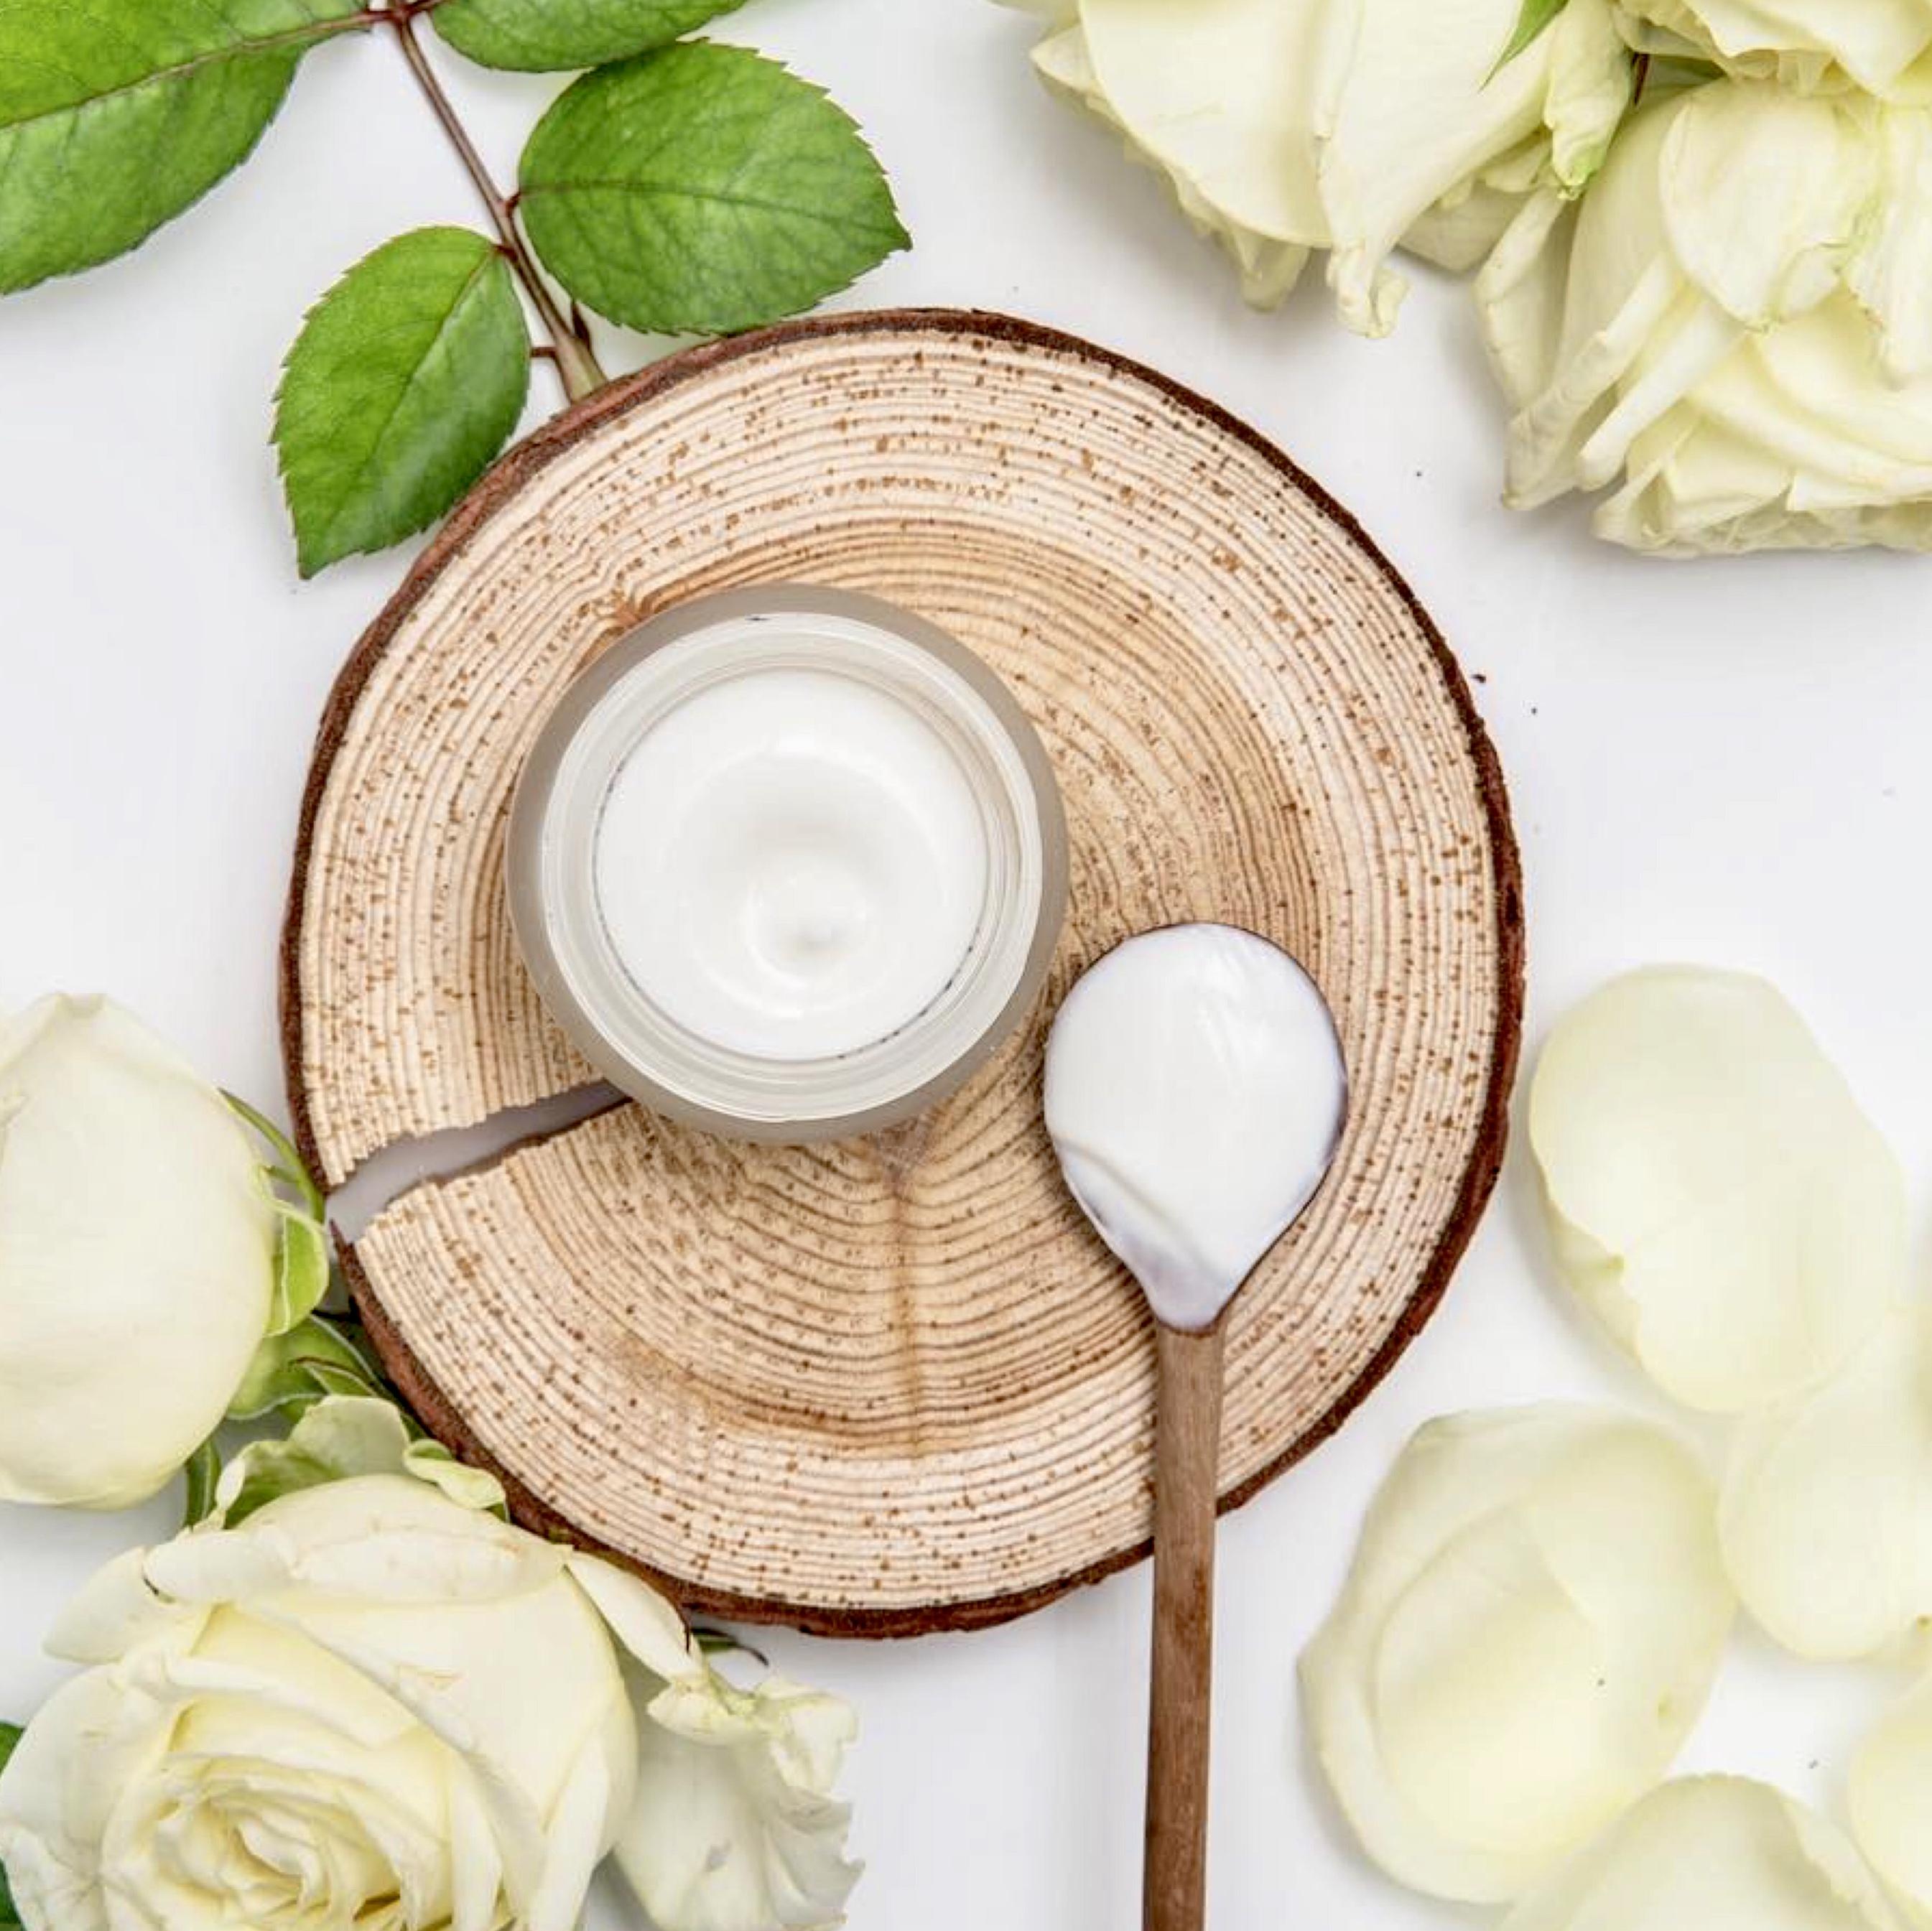 tips from the expert; Korean skincare Urang cosmetics